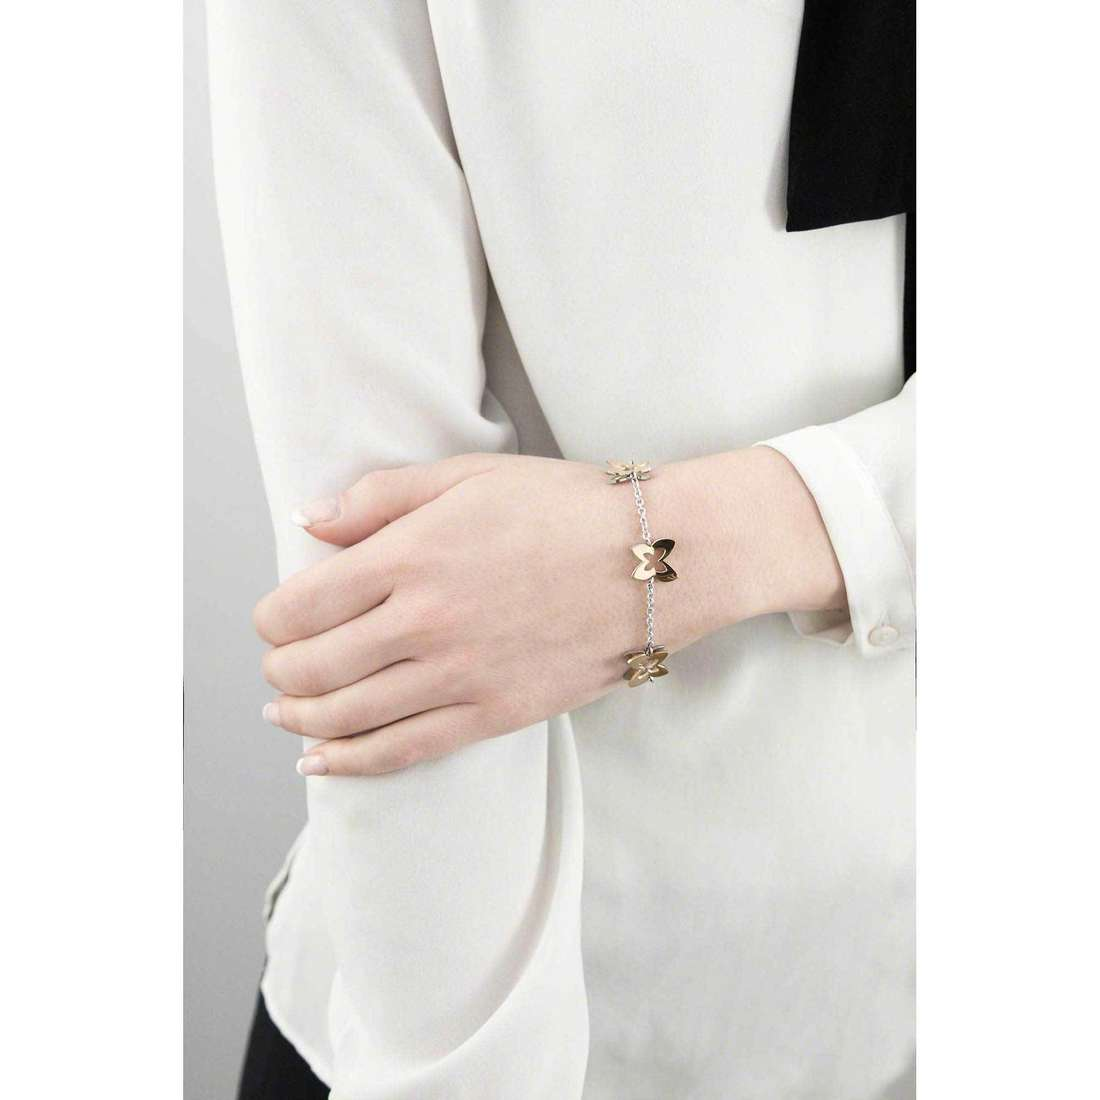 Sagapò bracciali Butterfly donna SBF11 indosso